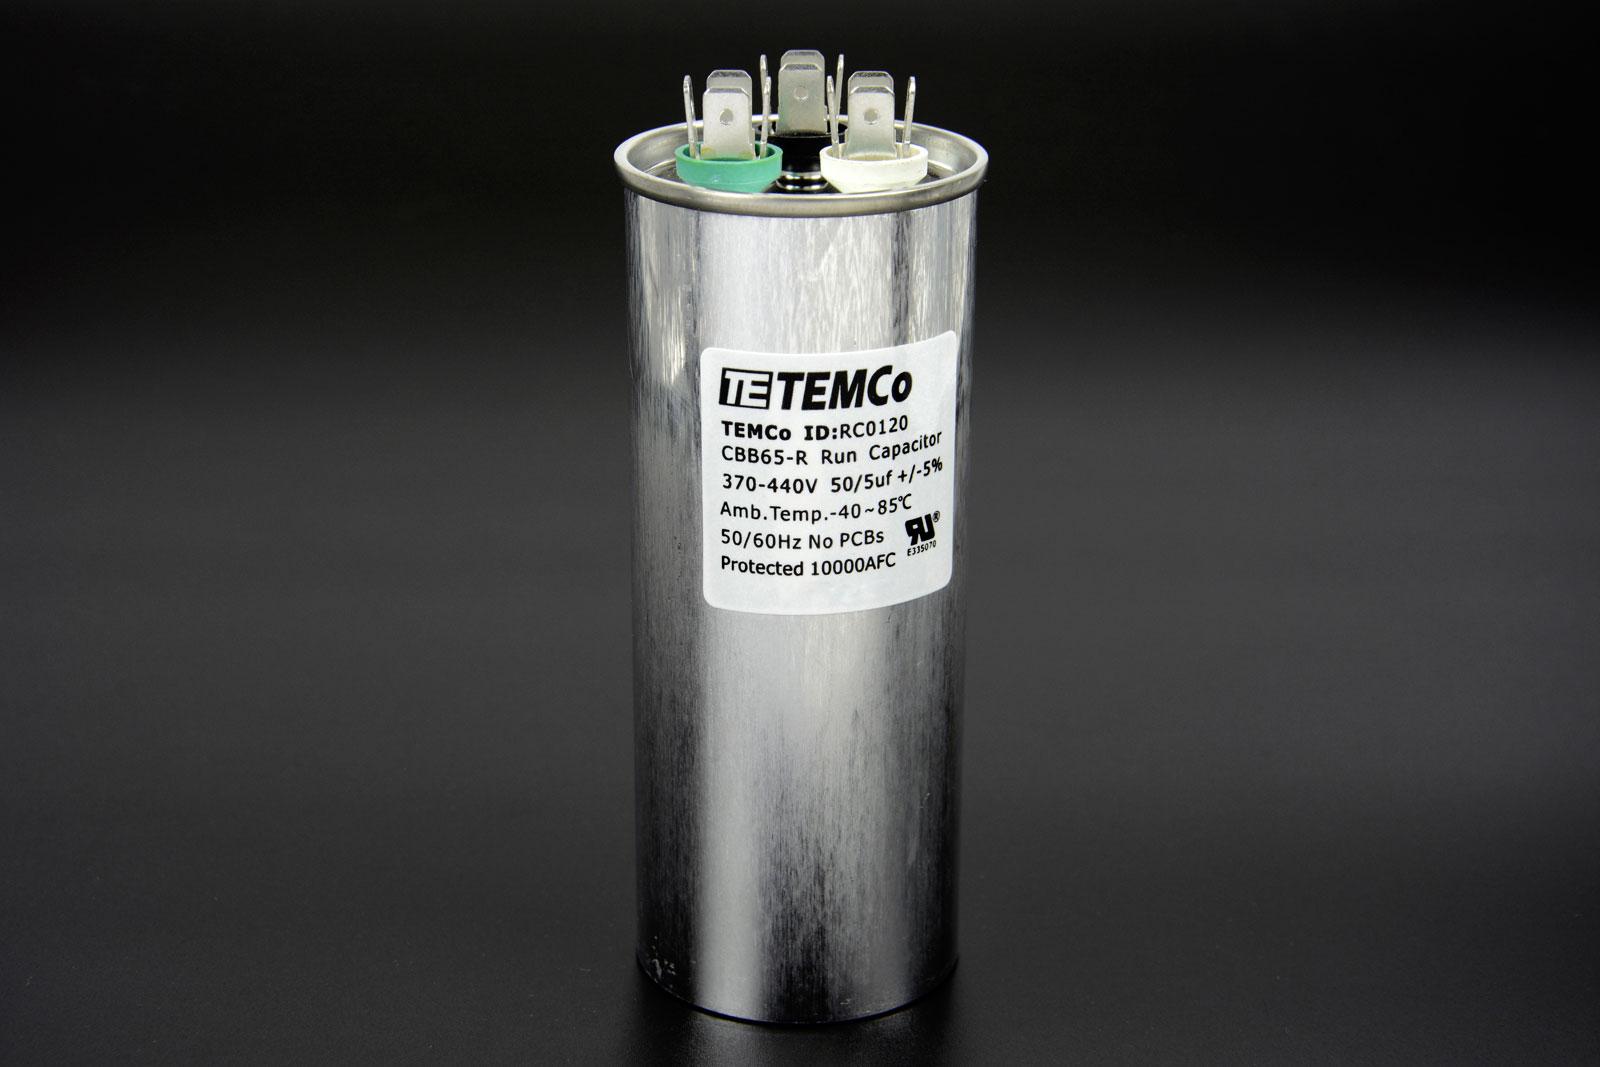 Temco 50 5 Mfd Uf Dual Run Capacitor 370 440 Vac Volts Ac